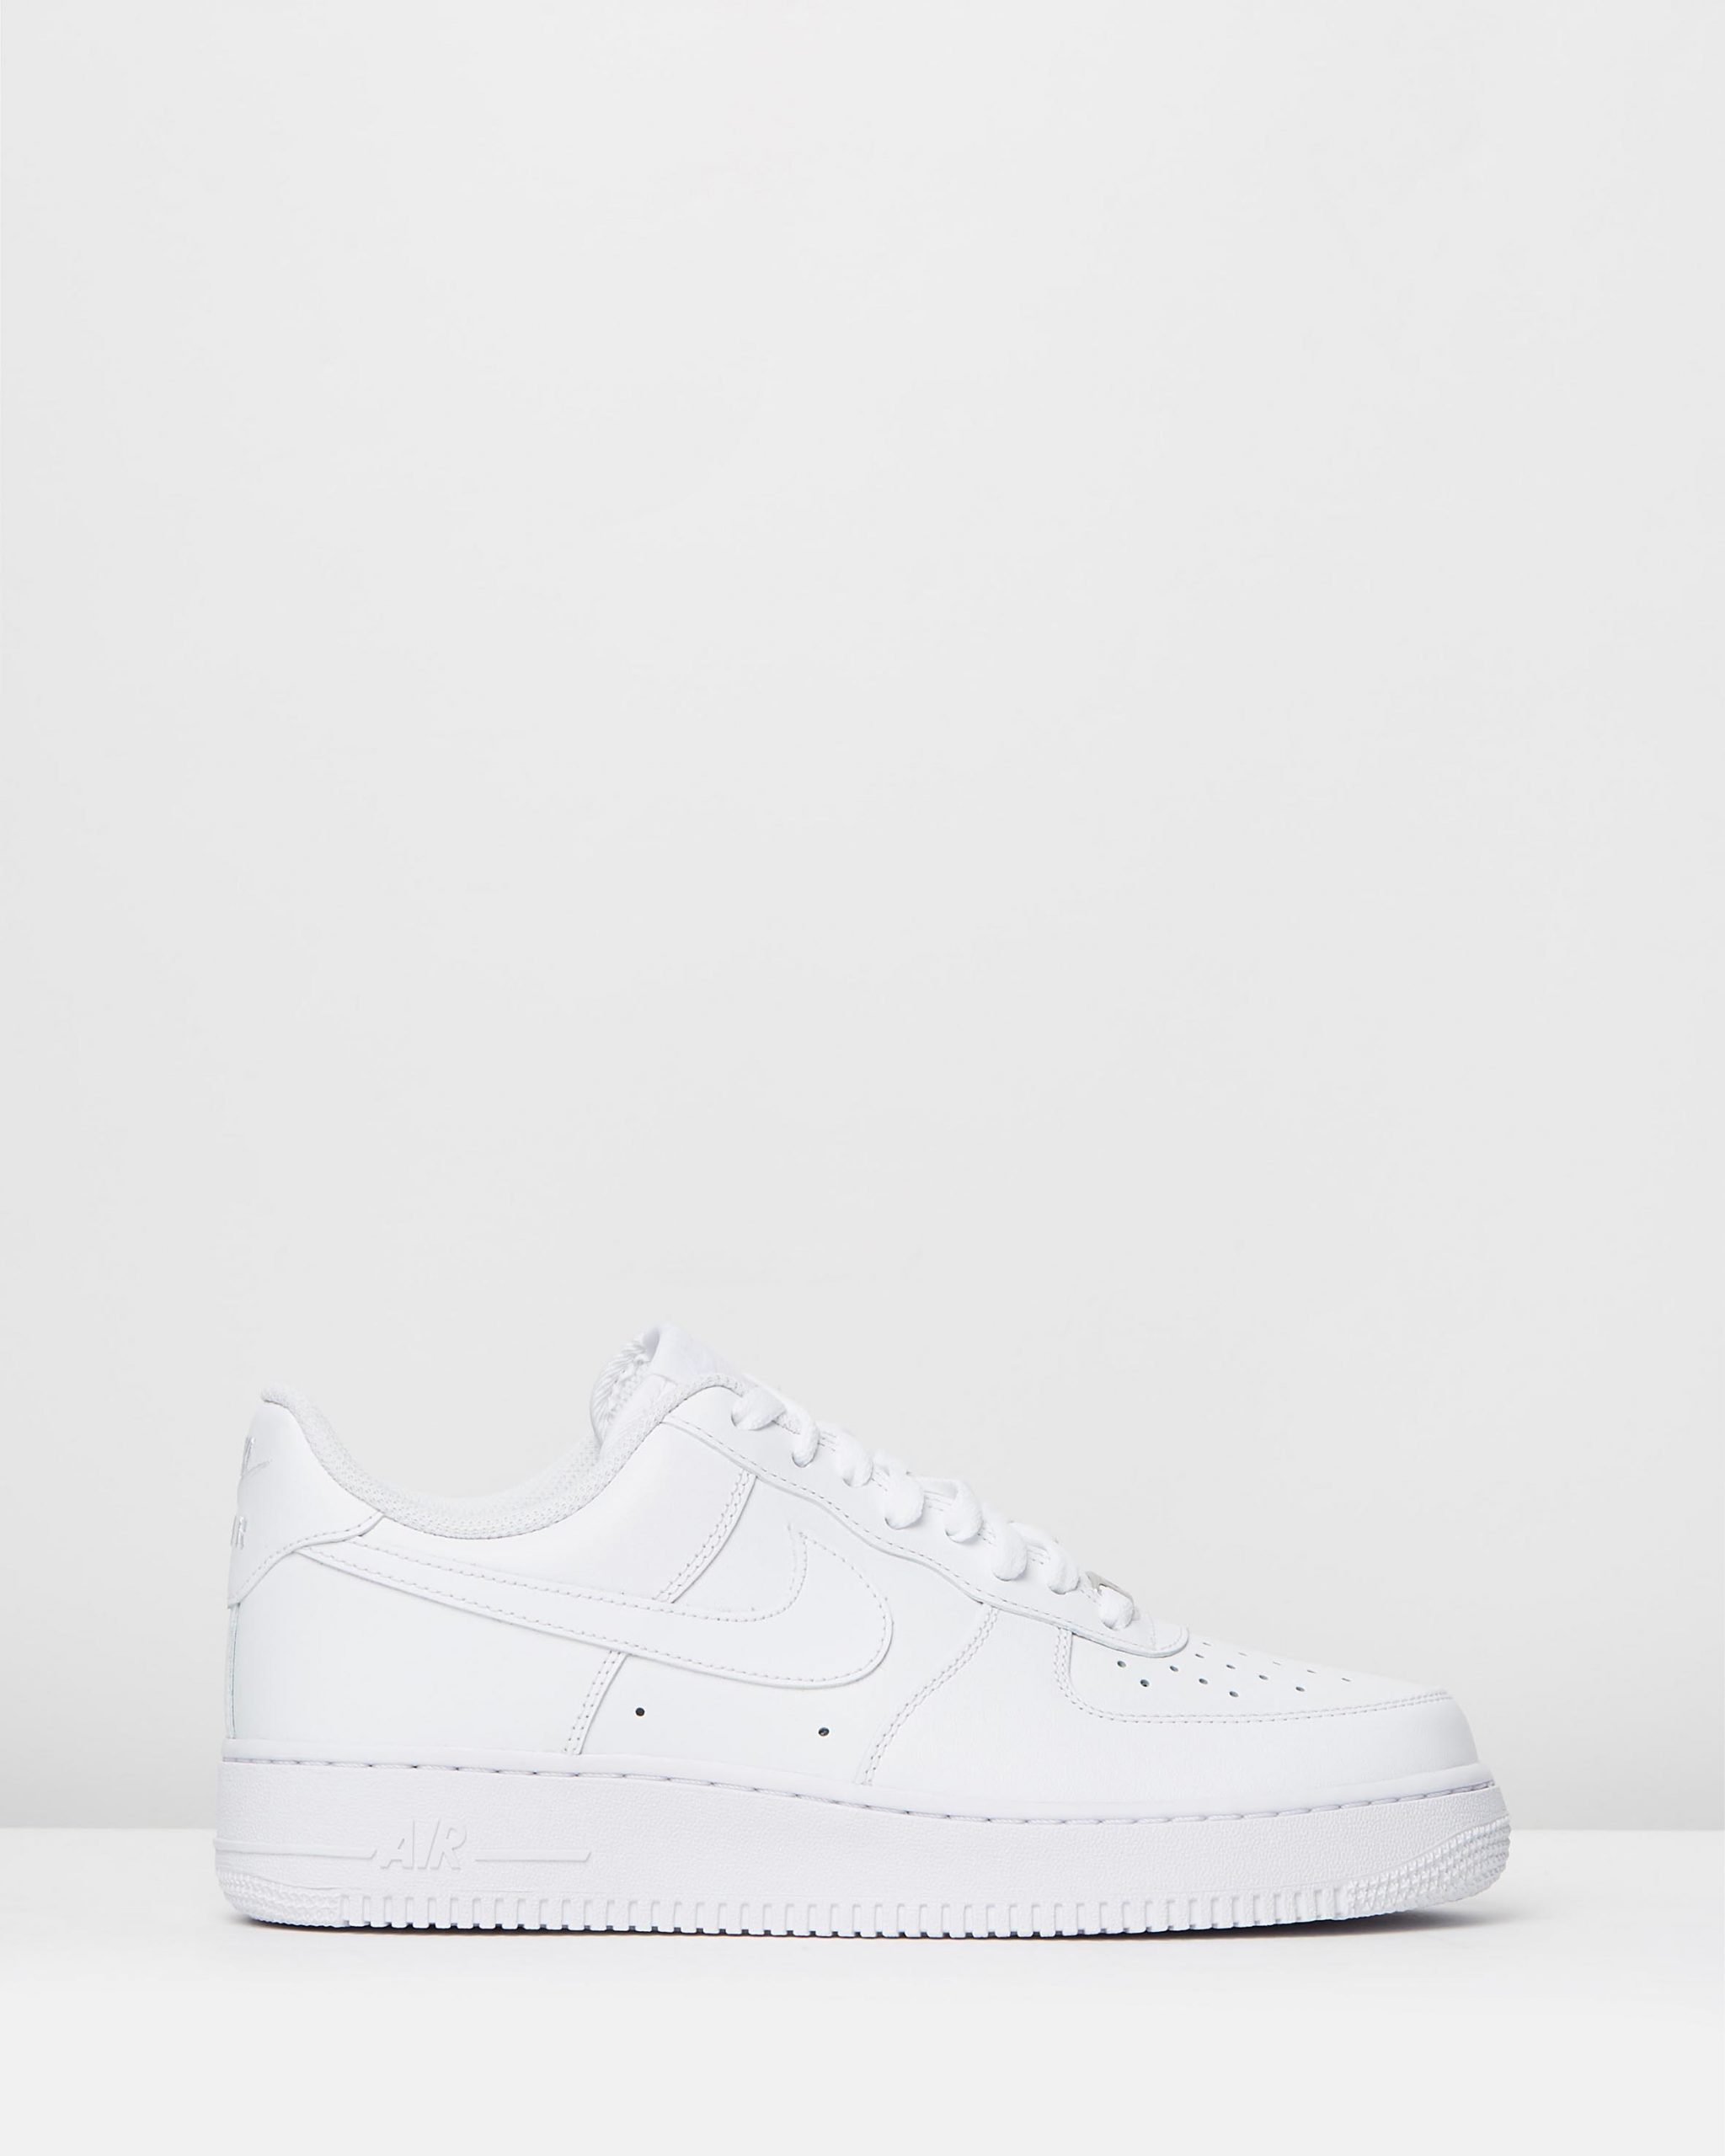 Nike Men's Air Force 1 '07 White Sneakers